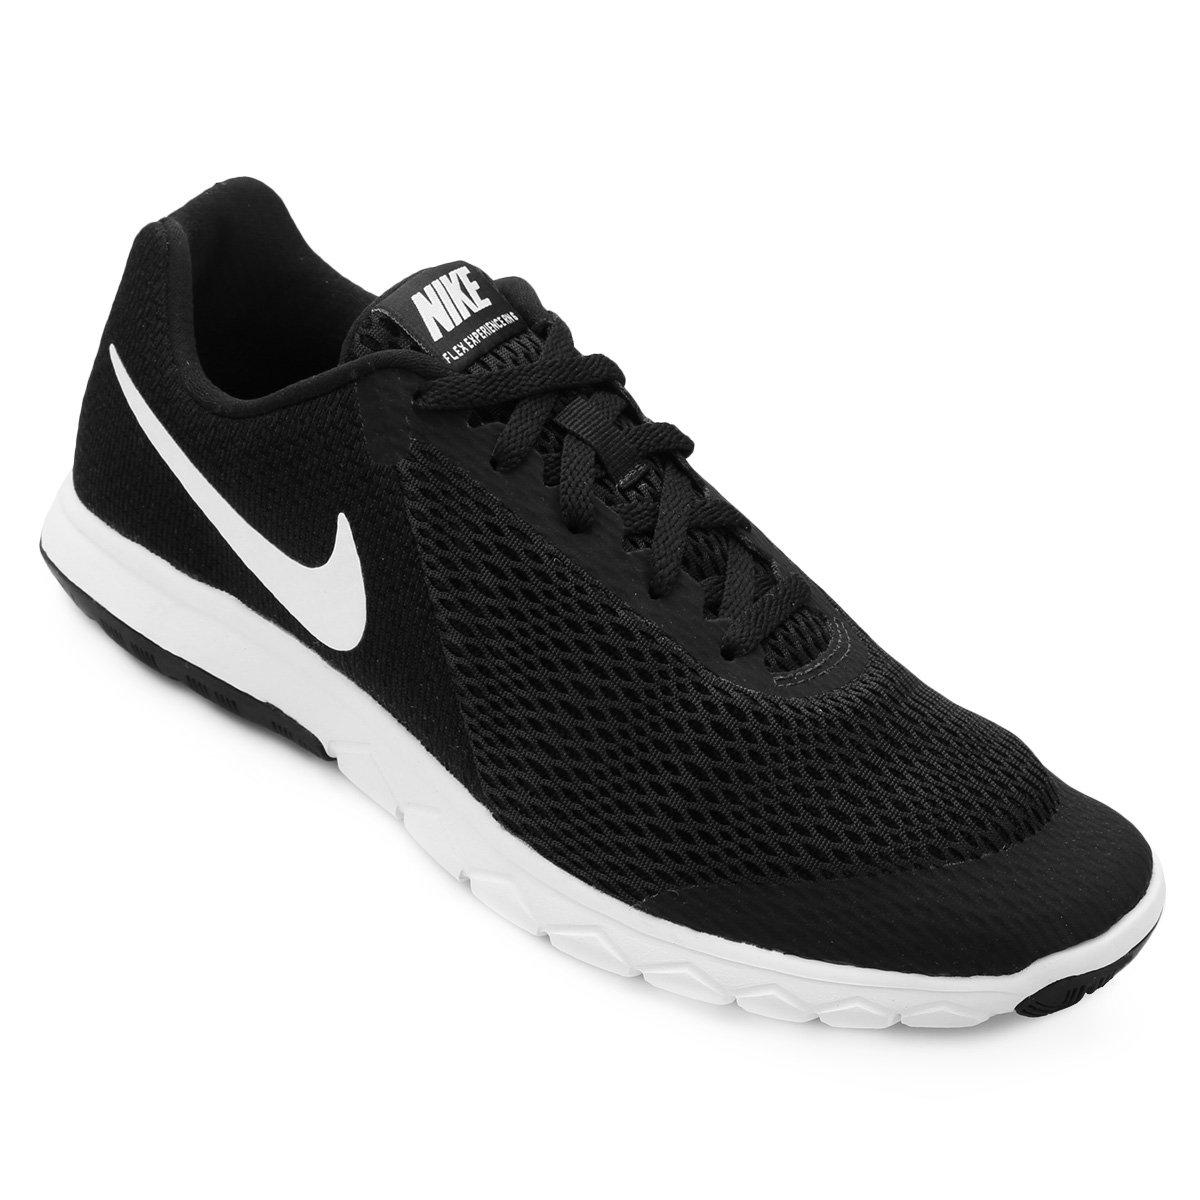 a37f141a85f Tênis Nike Flex Experience Rn 6 Feminino - Preto e Branco - Compre Agora